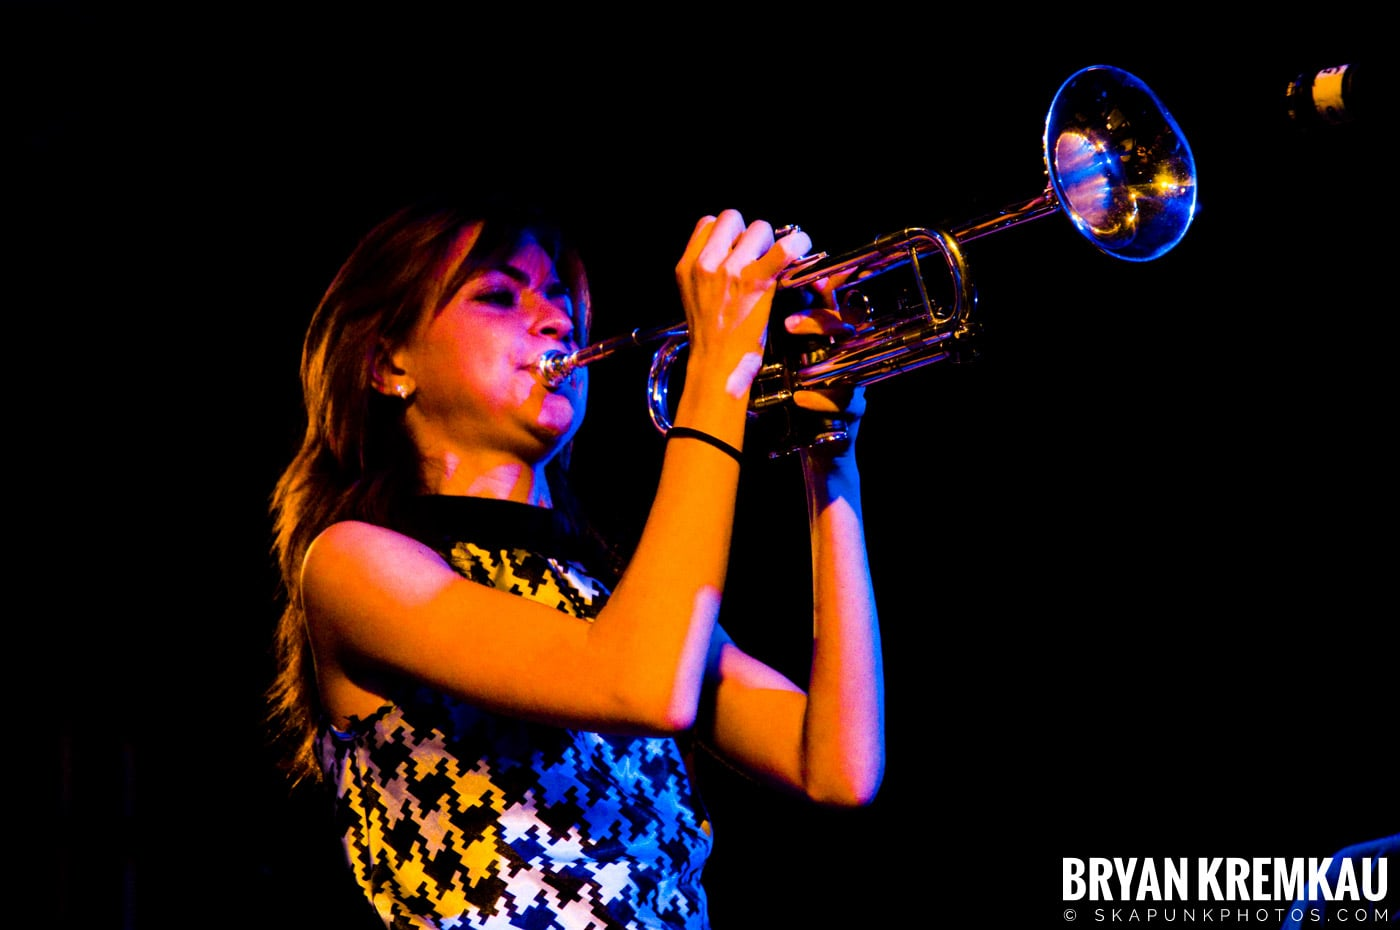 Avon Junkies (Ska is Dead Tour) @ Starland Ballroom, Sayreville, NJ - 11.15.09 (11)